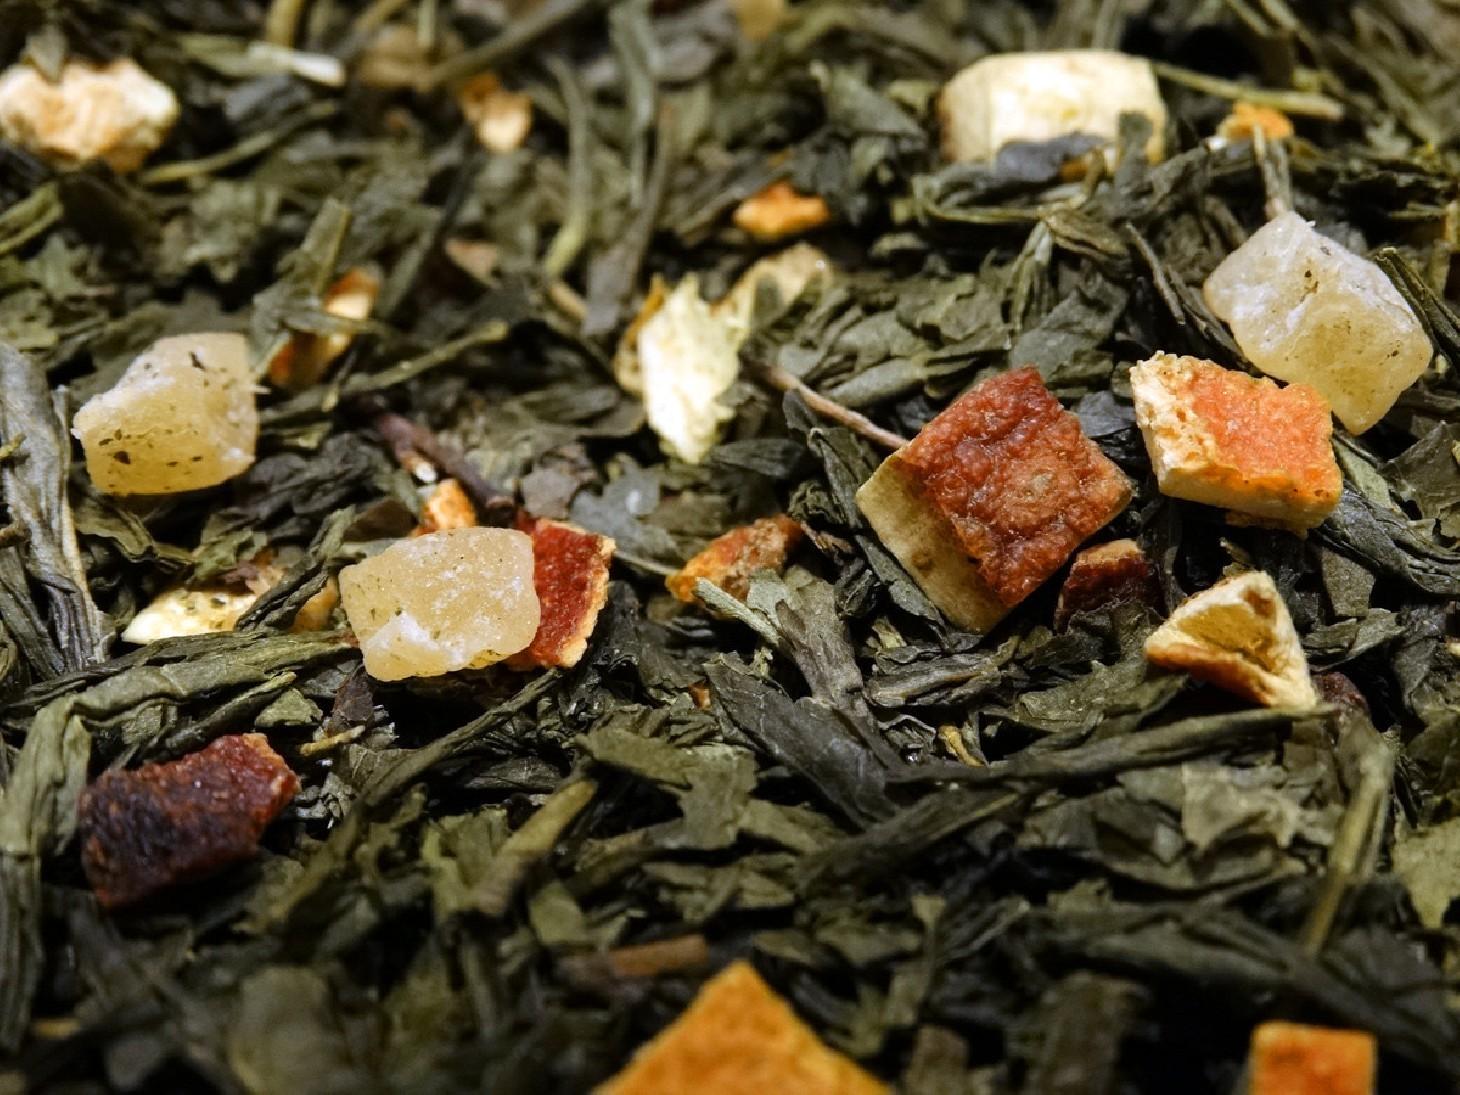 thé vert parfumé ananas firenze par tea & cie comptoir de thé